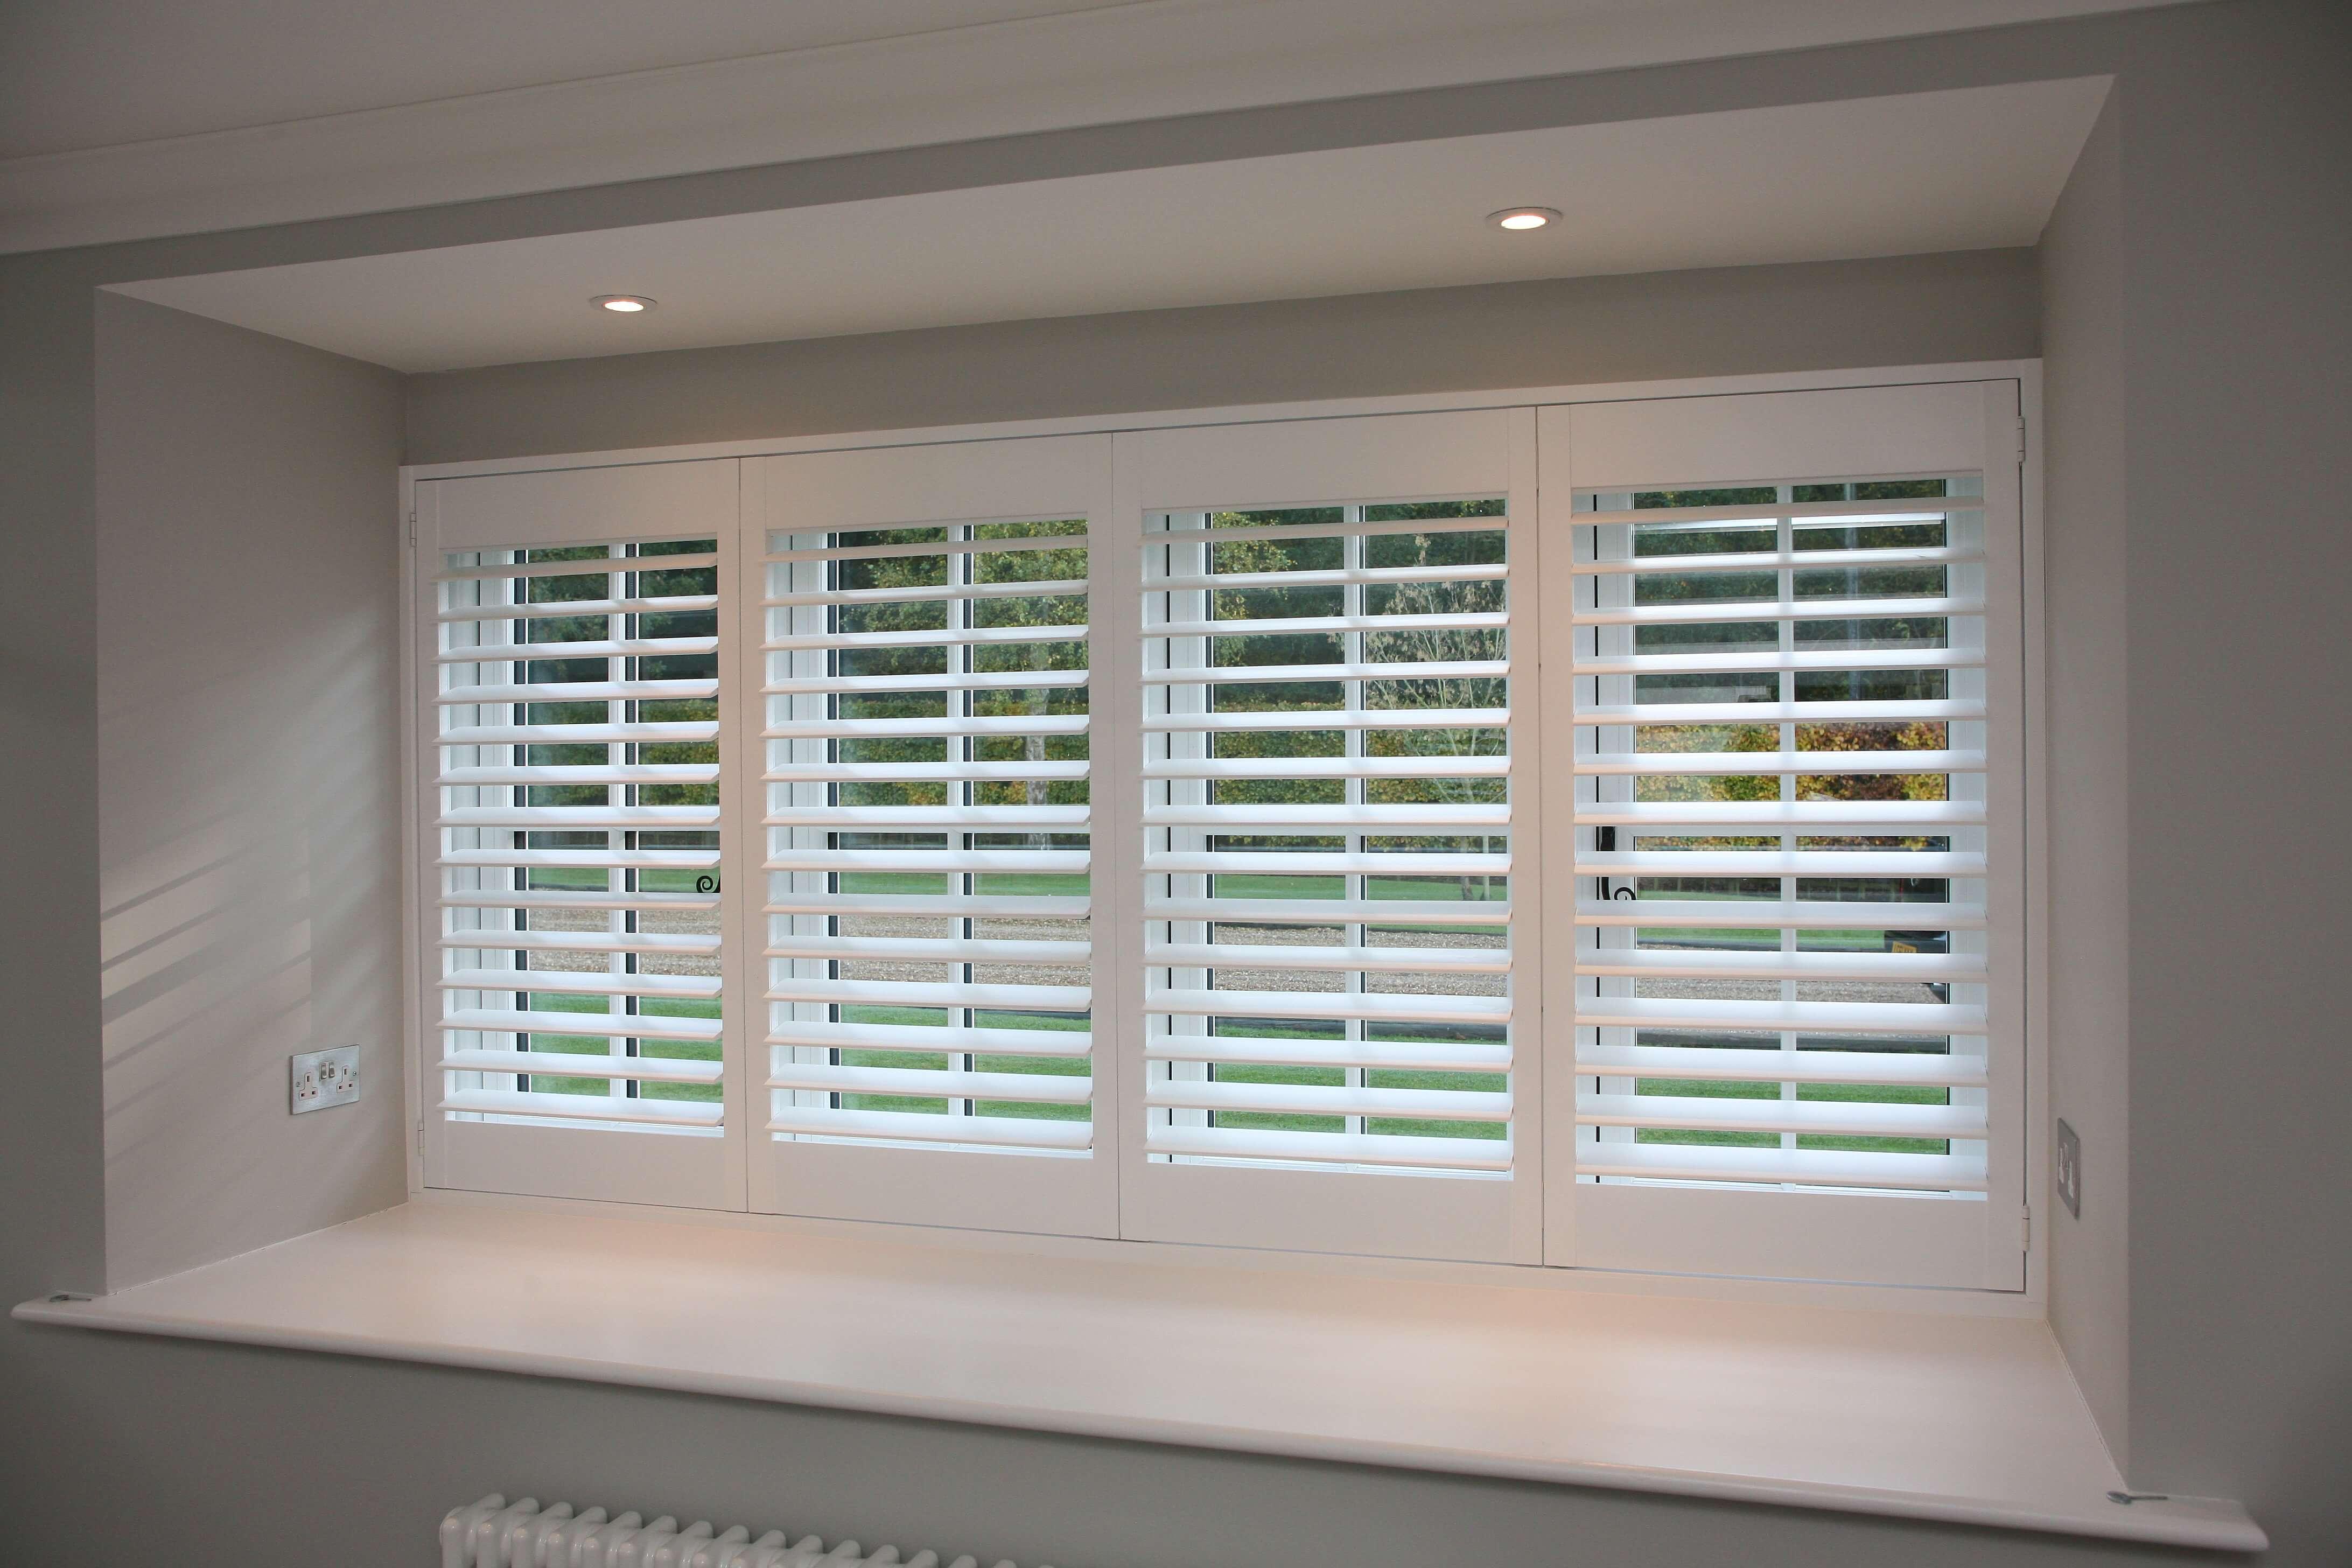 Made to measure window shutters in essex uk our gallery - Measure exterior window shutters ...